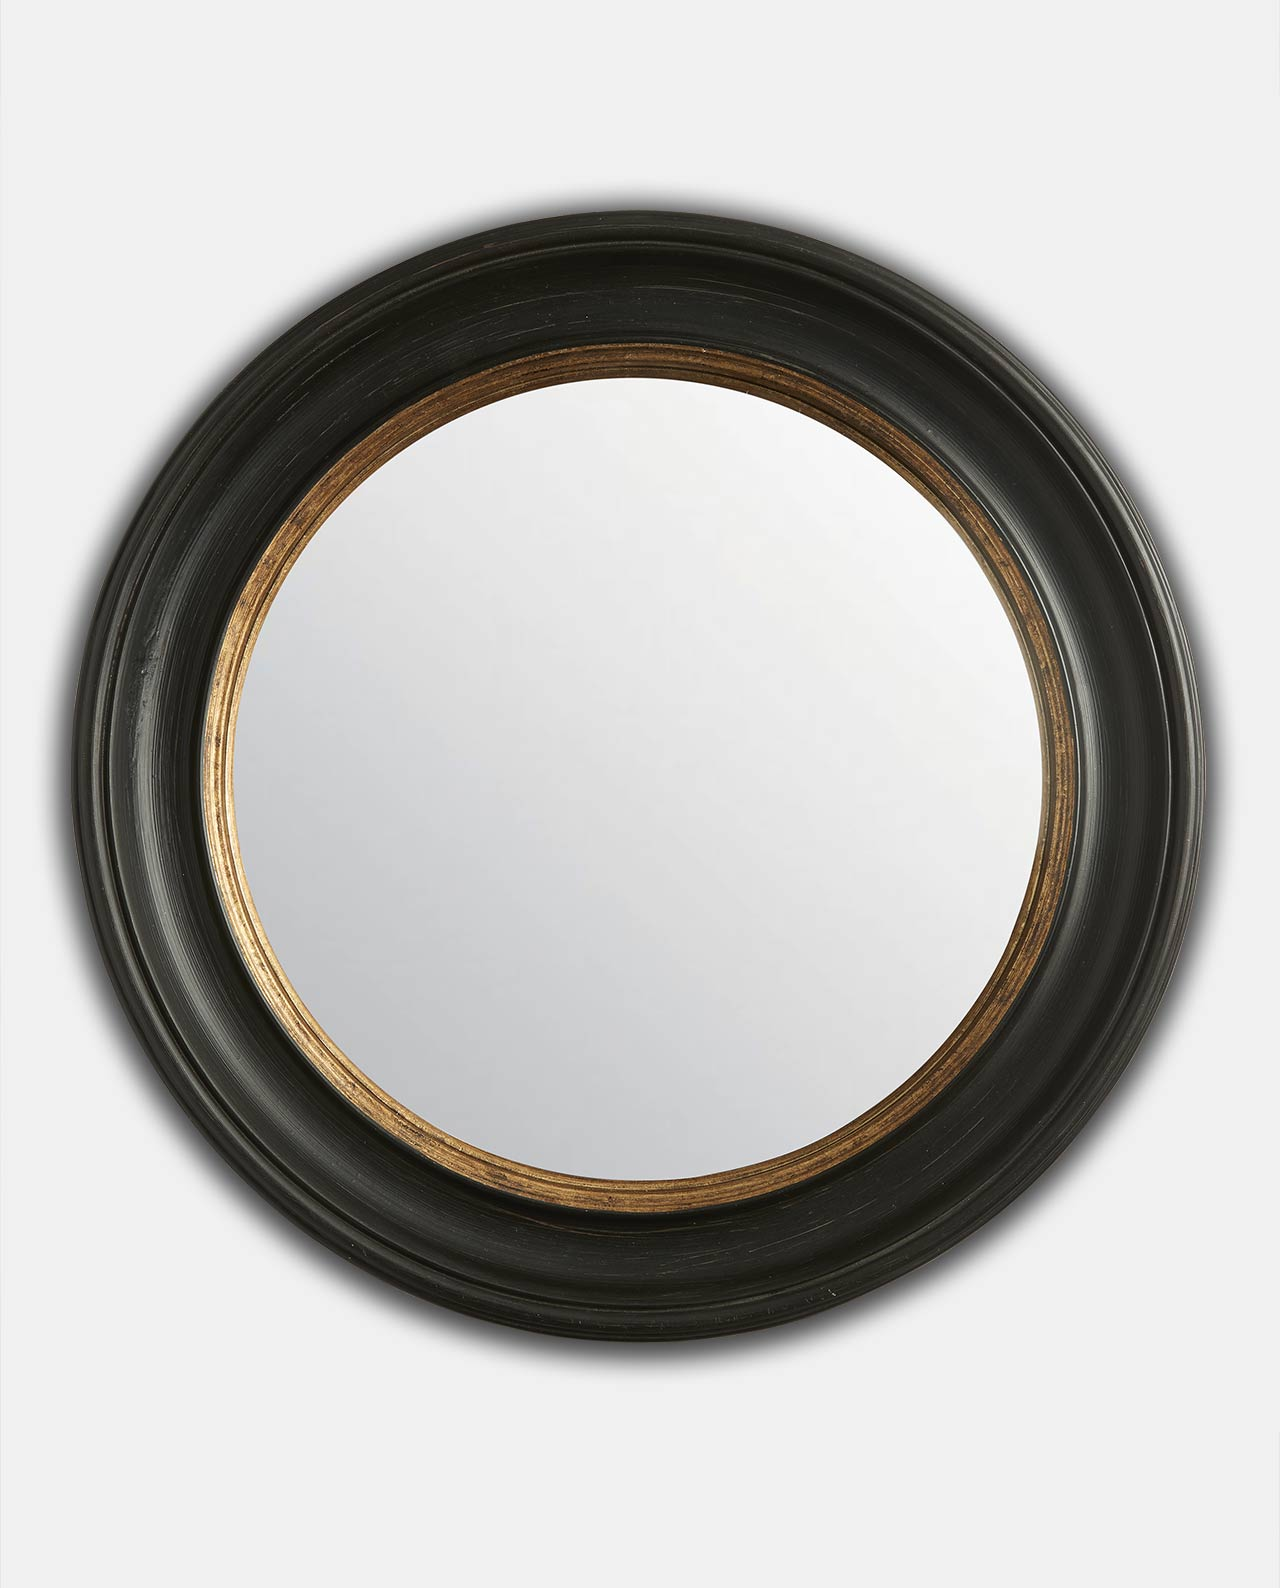 Black & Gold Round Convex Mirror 64cm